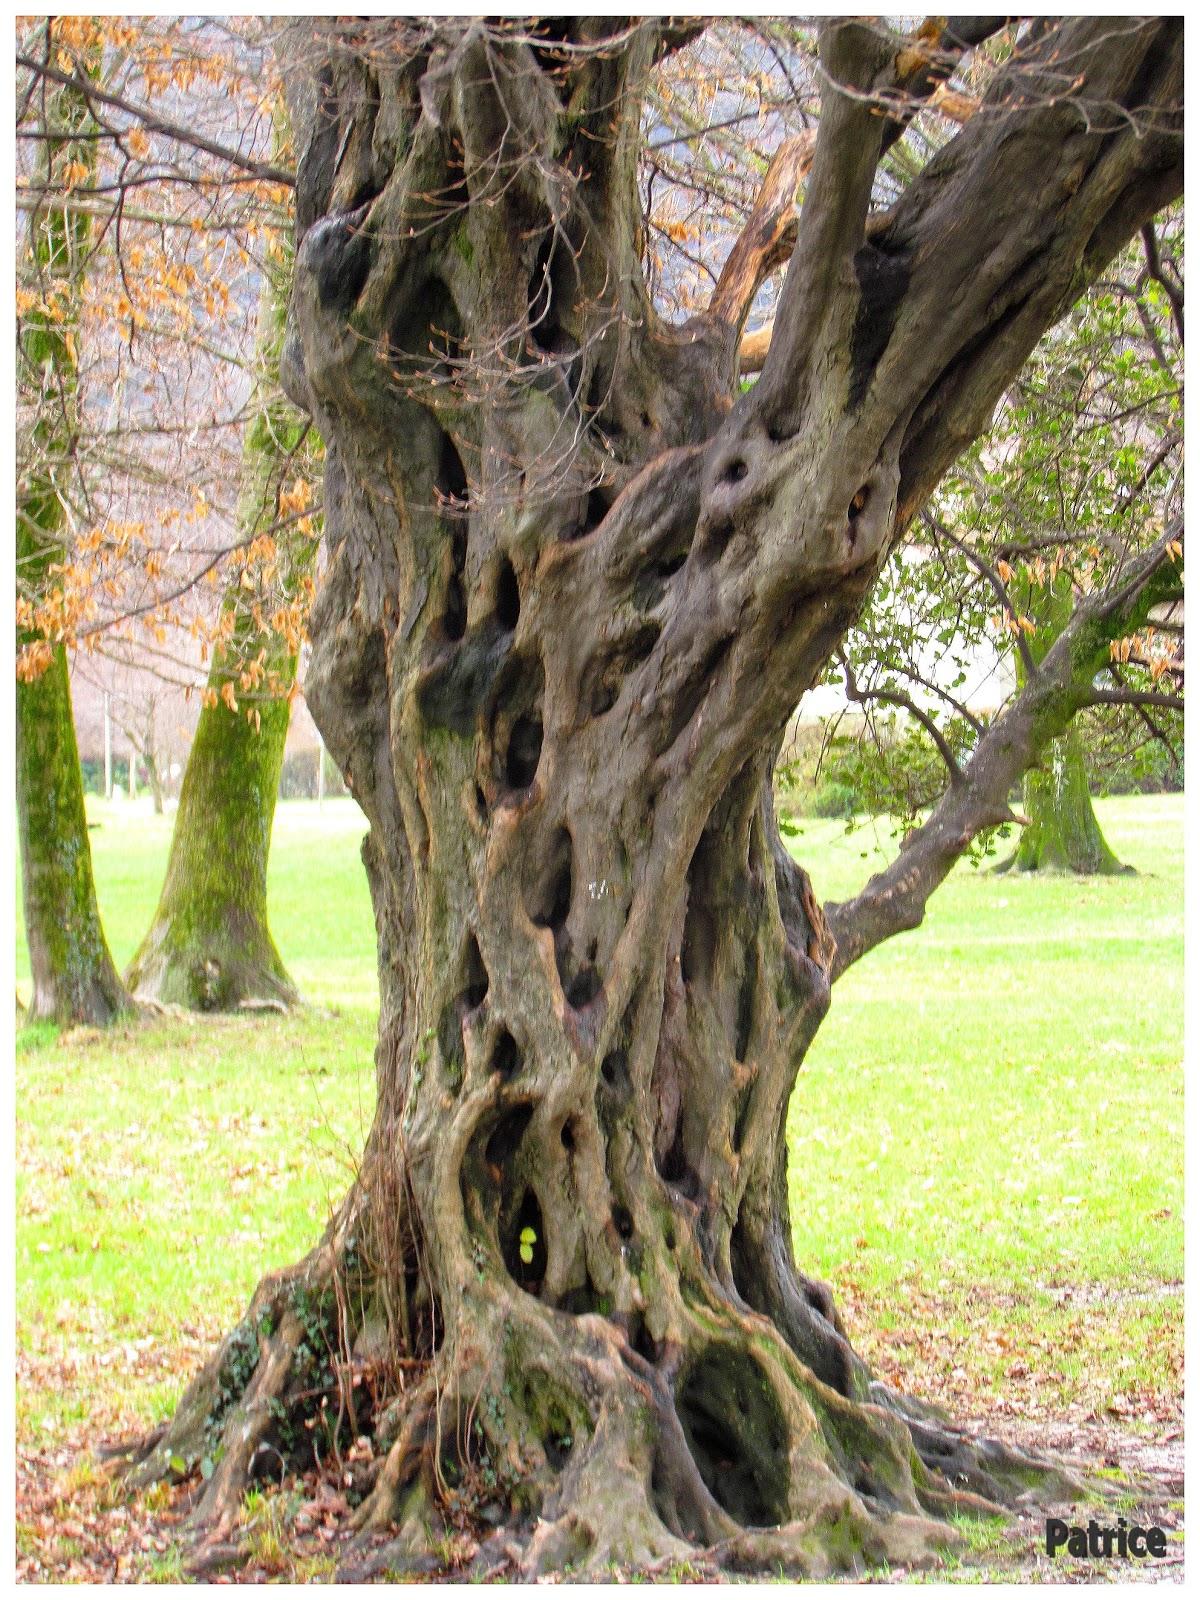 Blog photos de patrice balade a sassenage - Achat tronc arbre decoratif ...